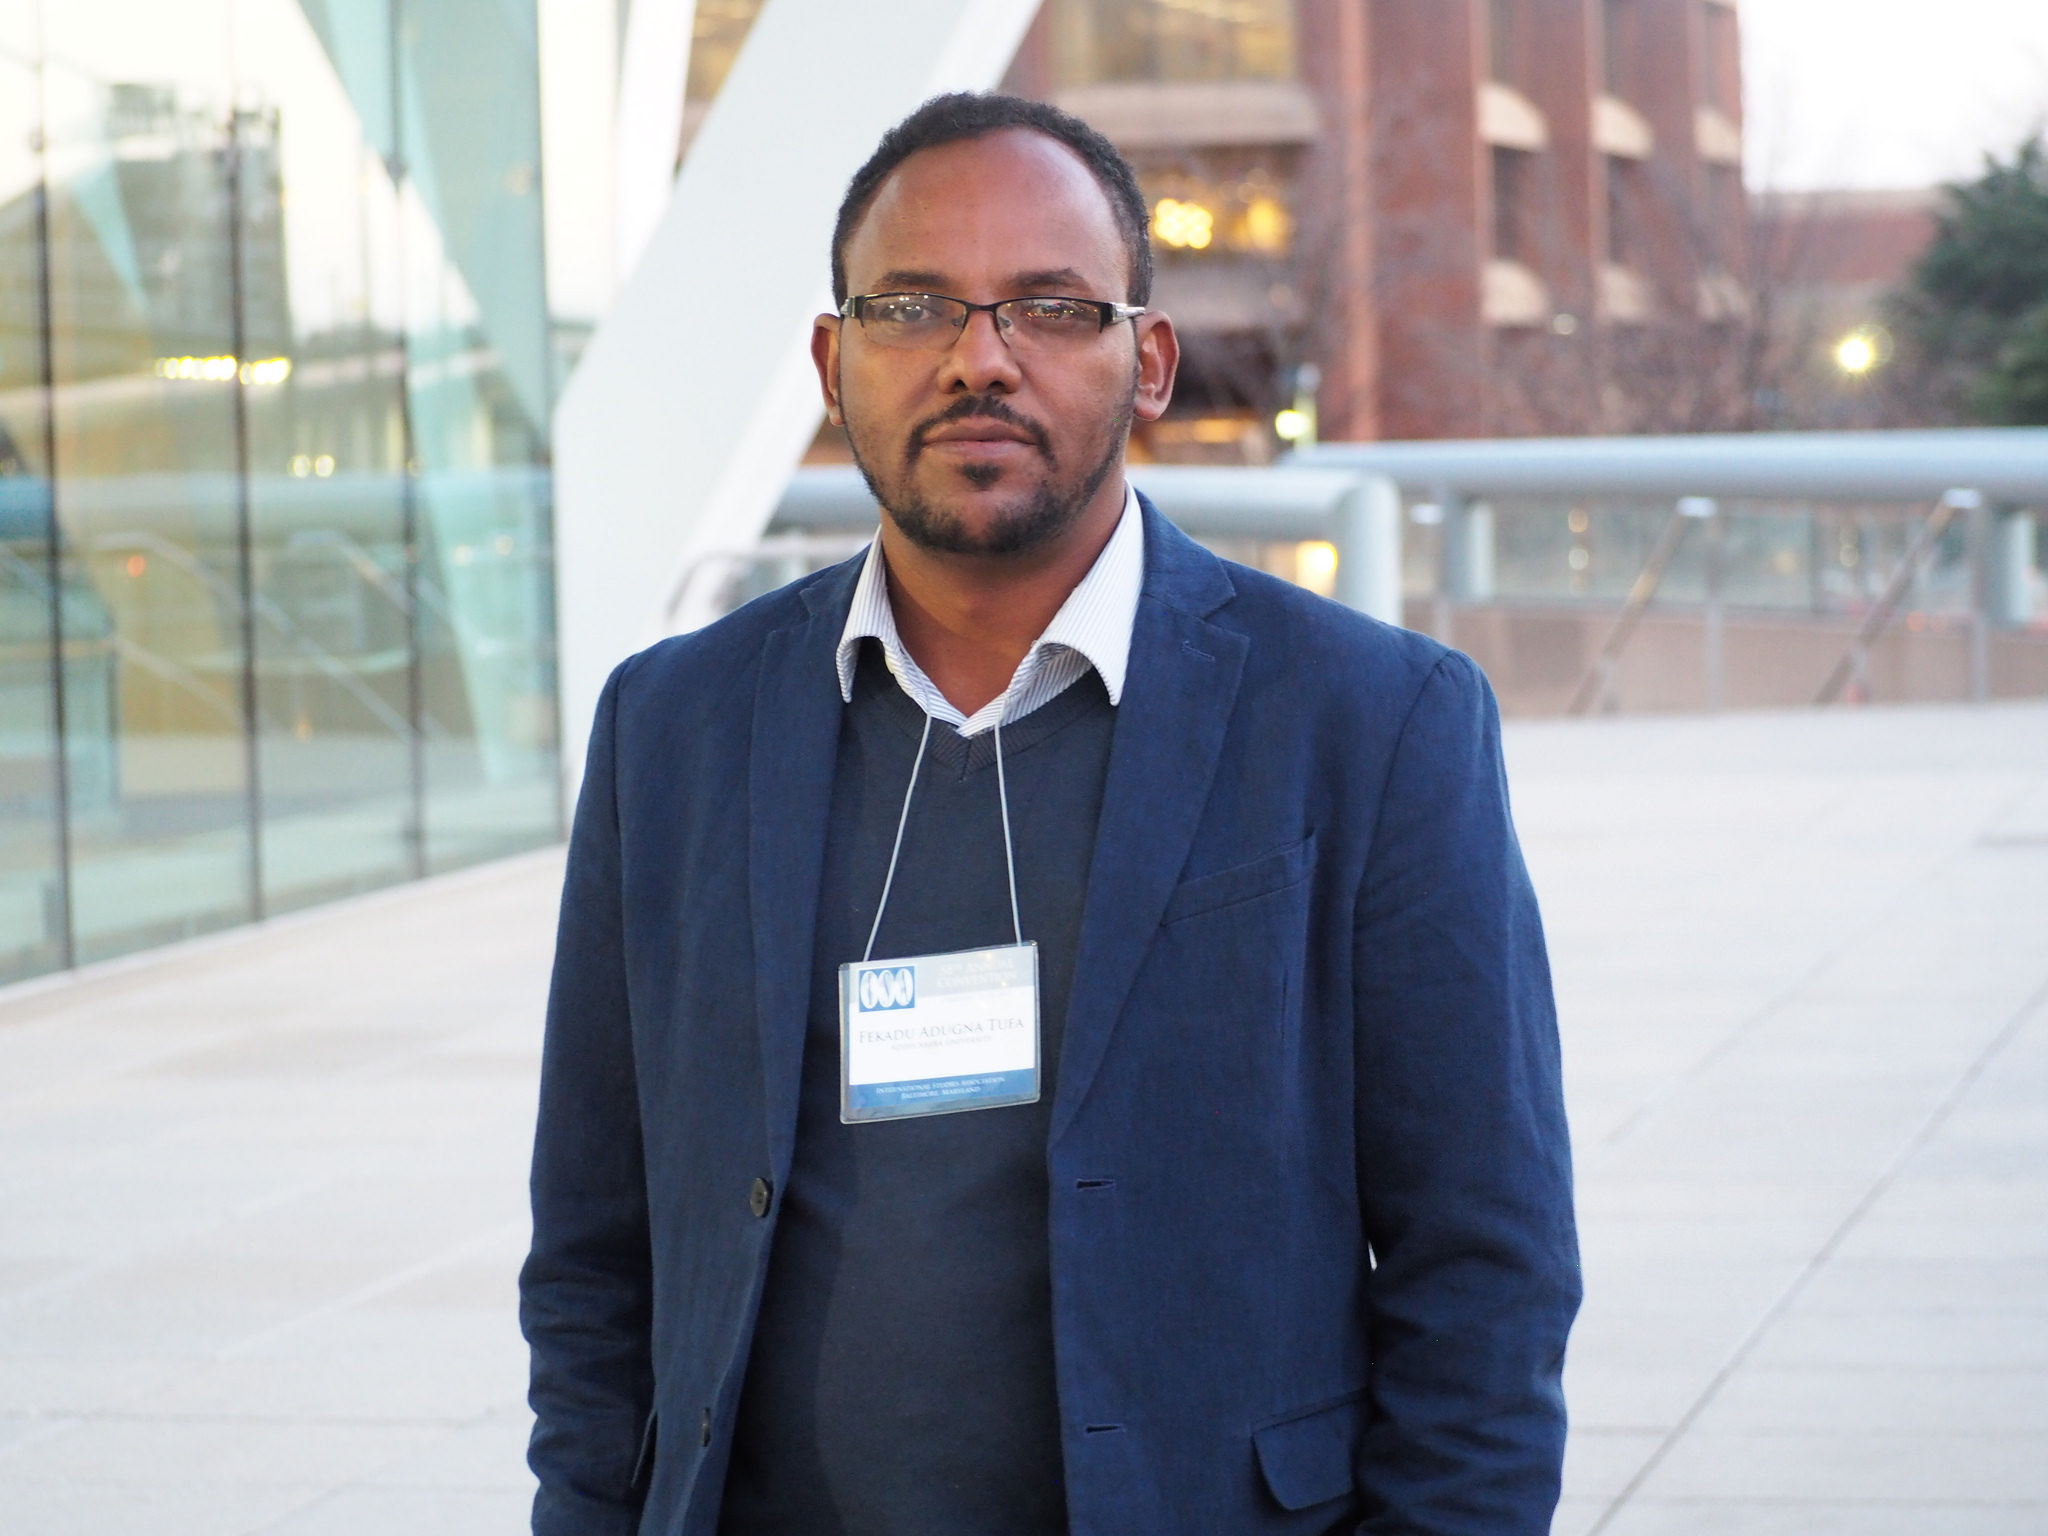 Professor Fekadu Adugna Tufa at the ISA